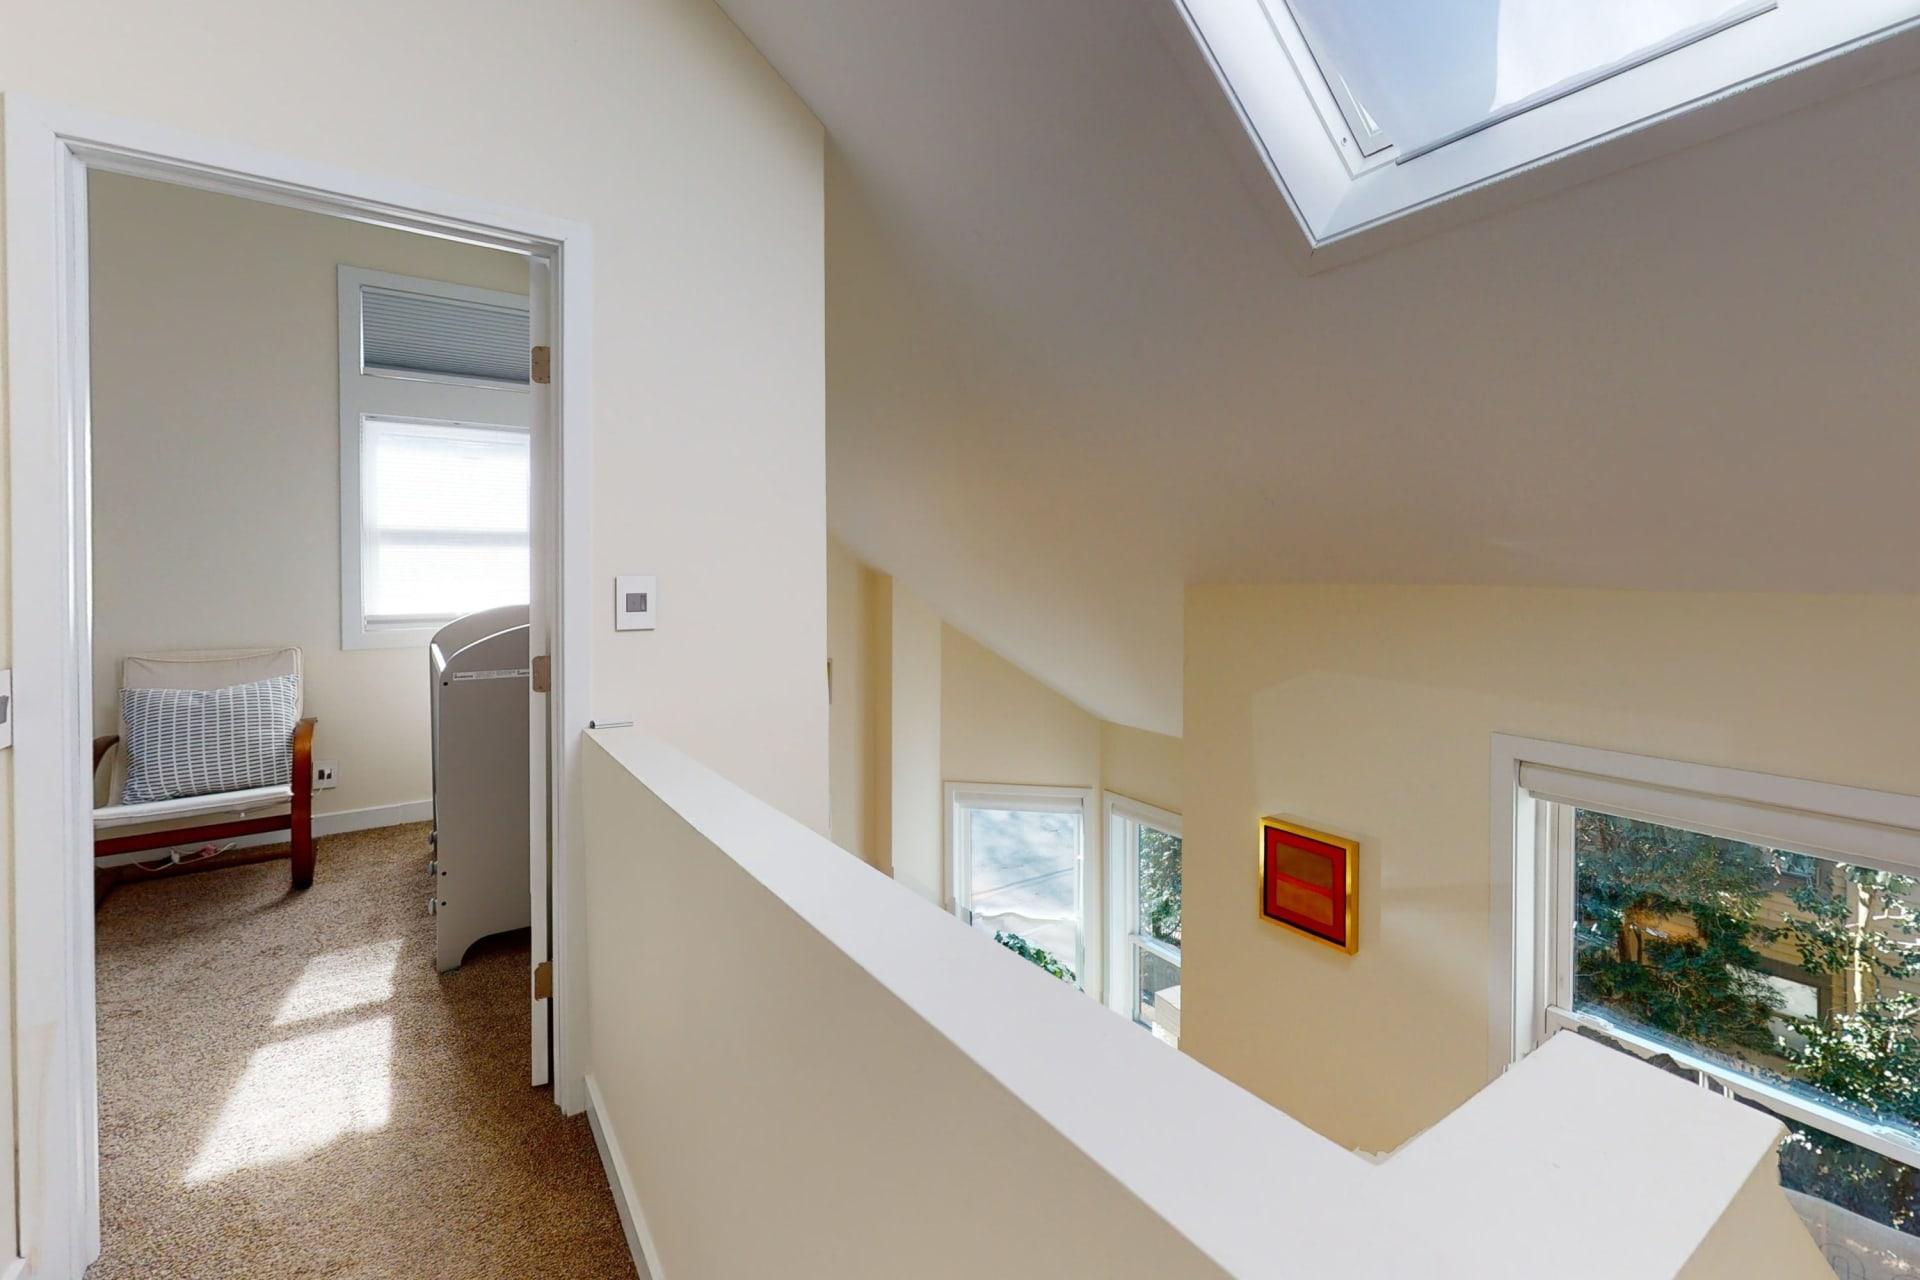 Cambridge Single-Family End Unit Townhouse for Rent photo